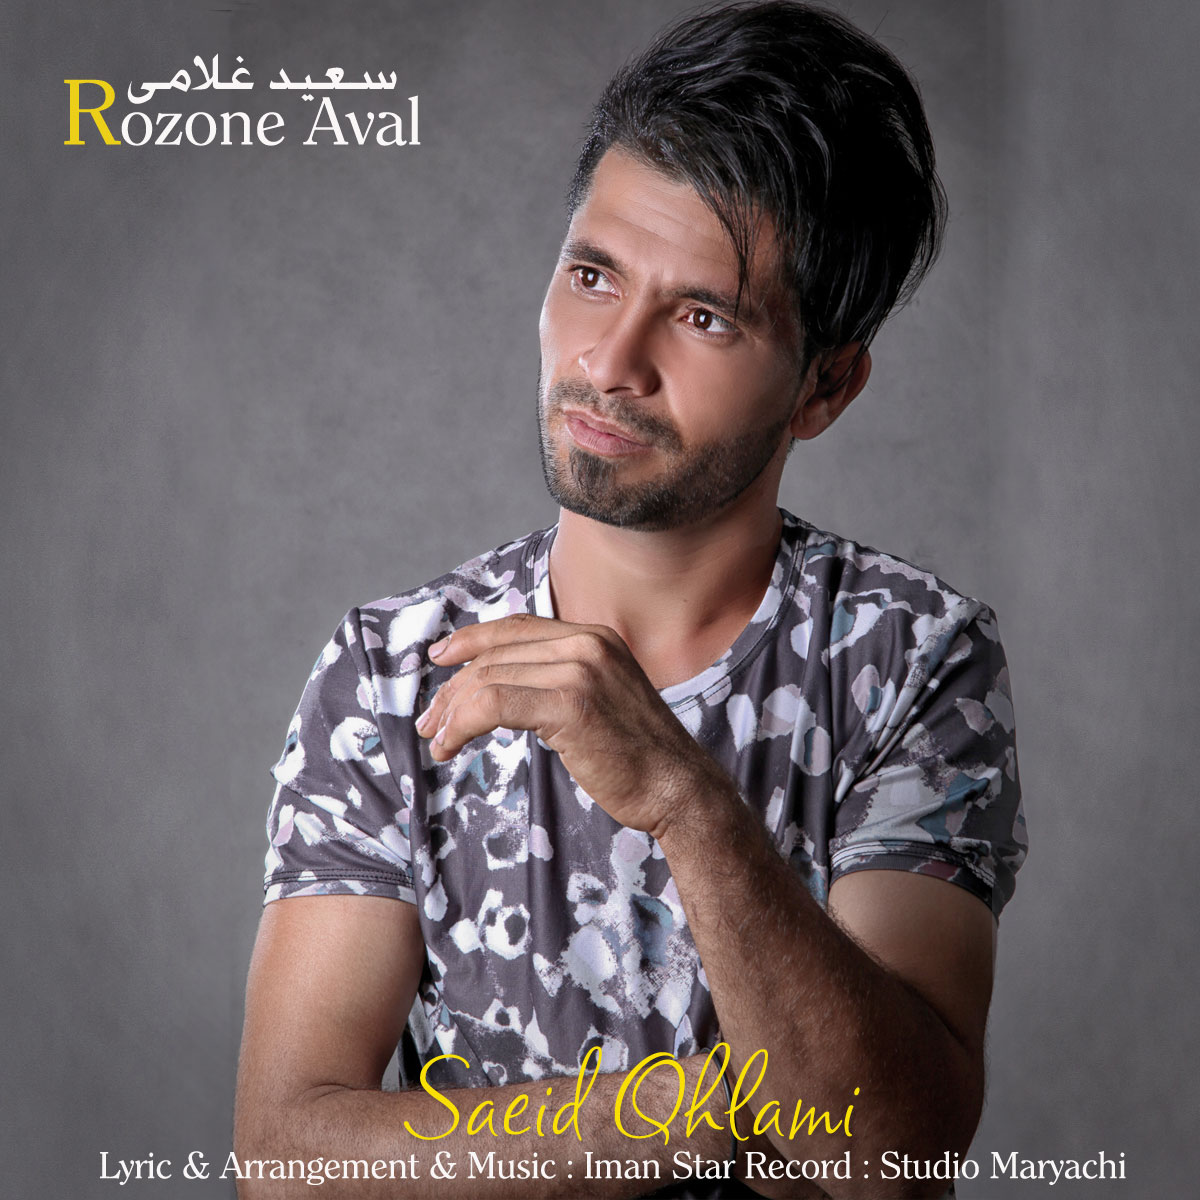 Saeid Qholami – Rozone Aval